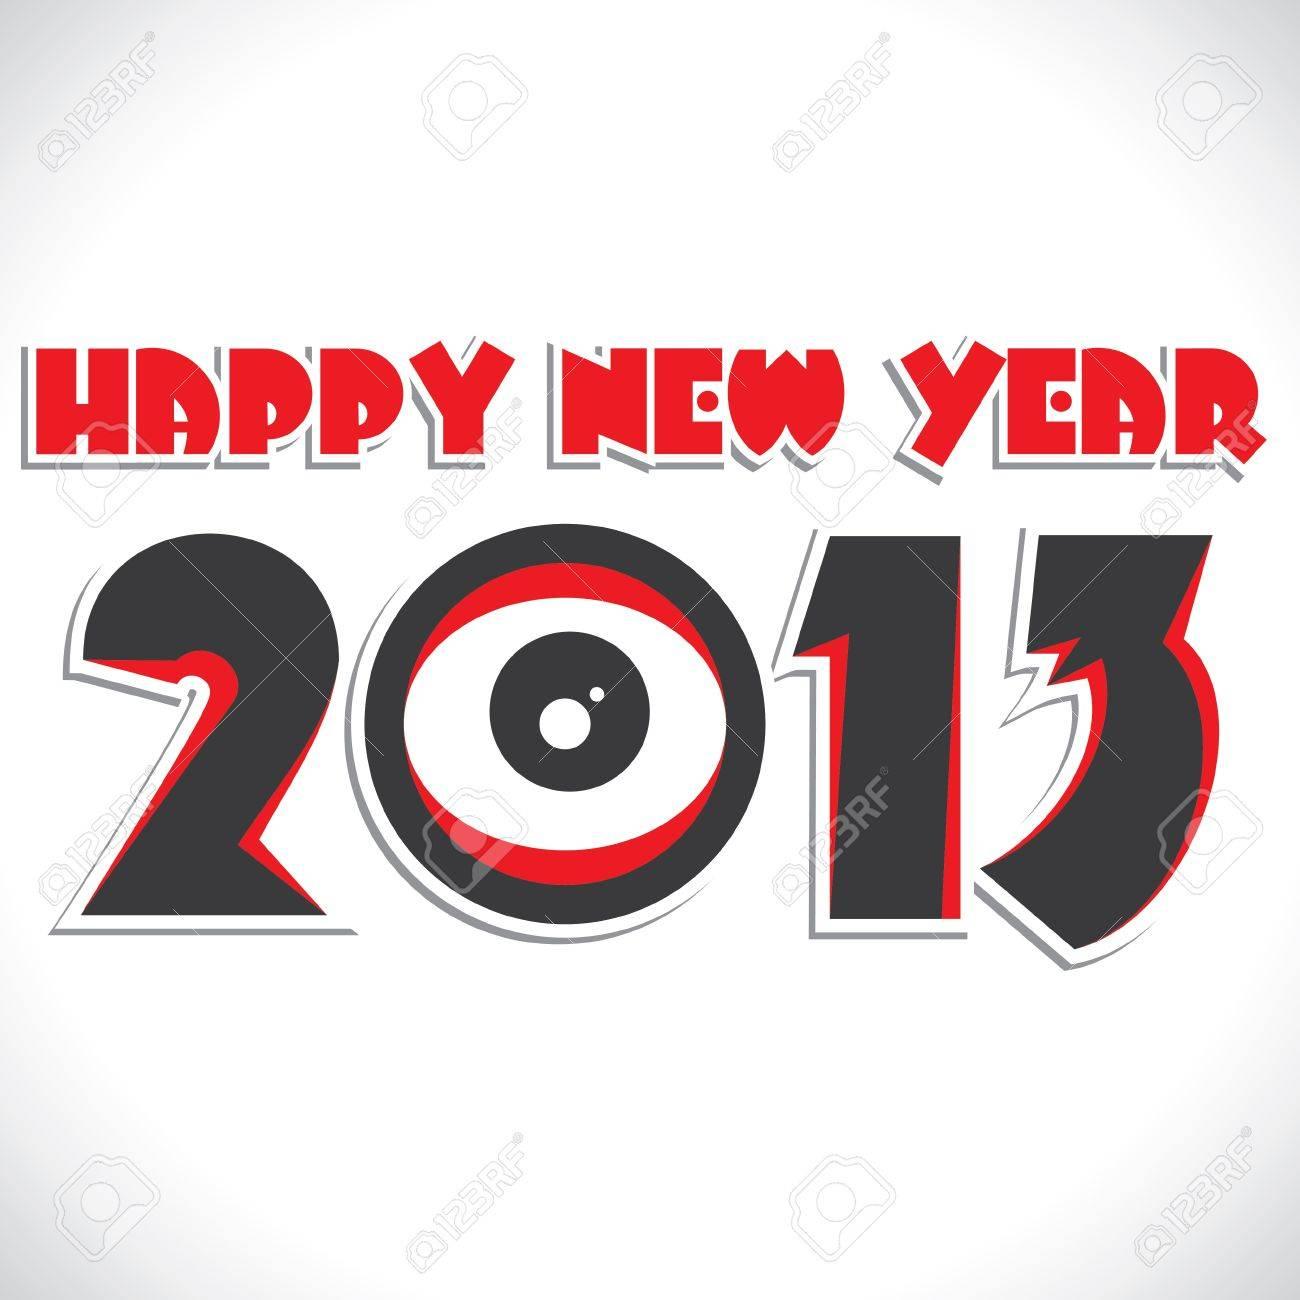 red happy new year 2013 stock vector Stock Vector - 16845717